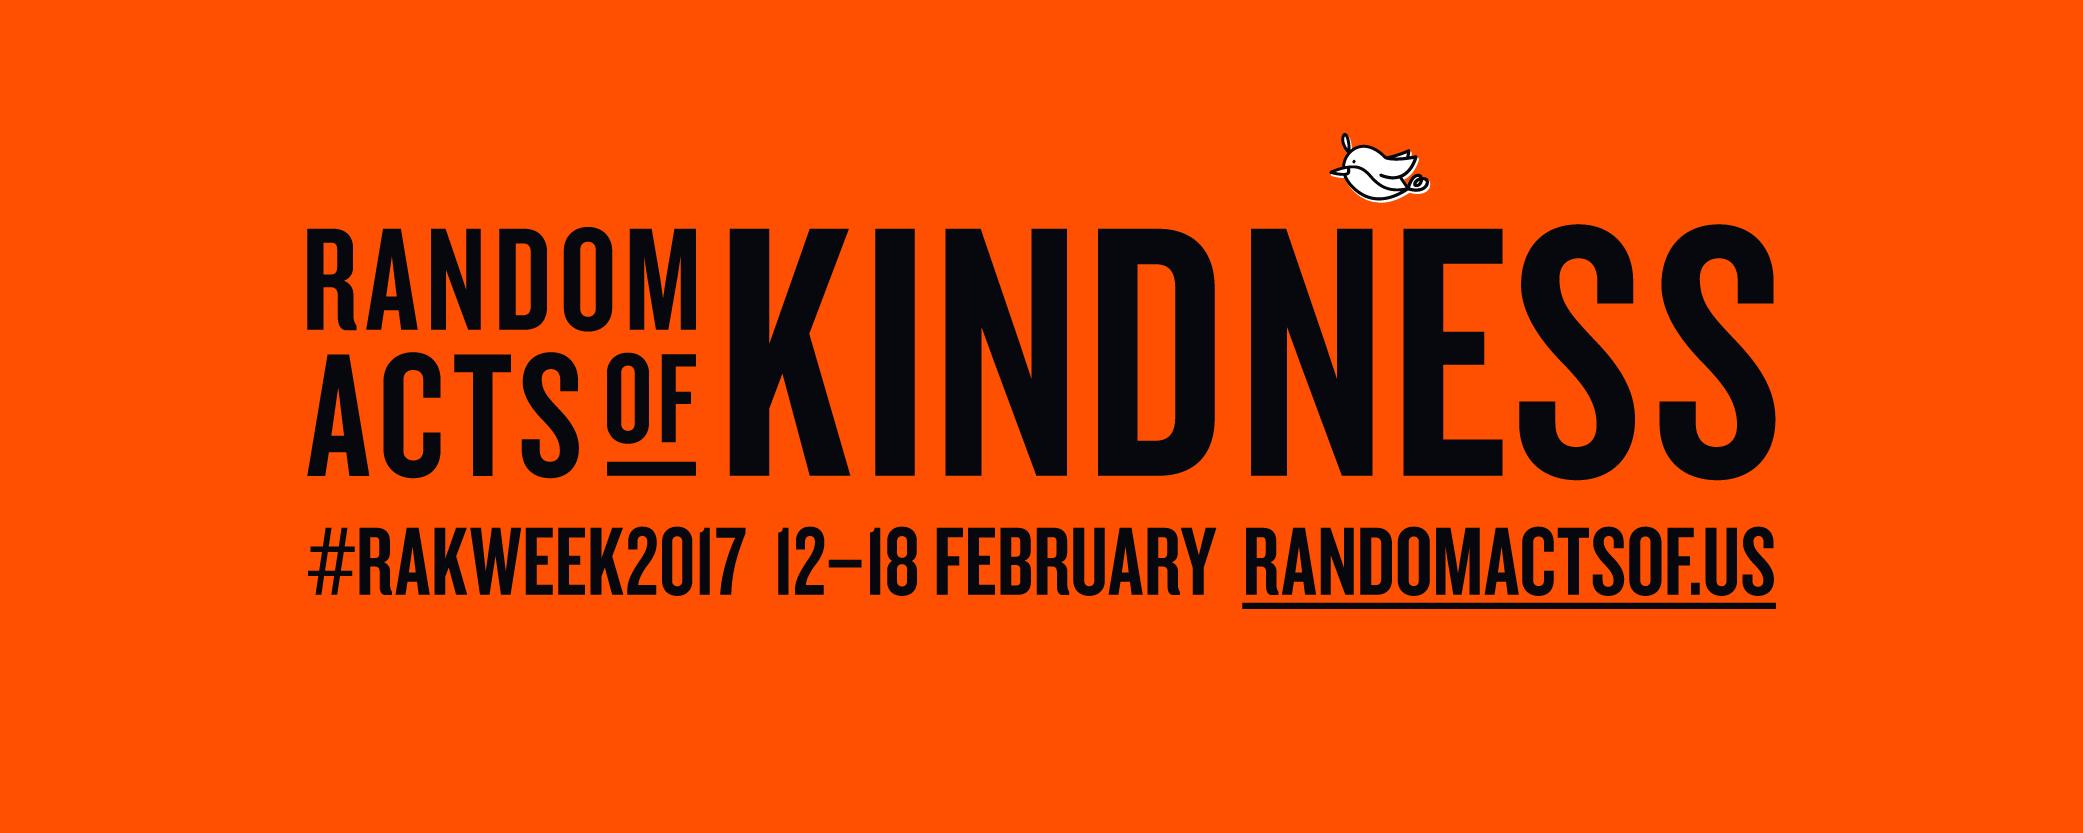 Random Acts of Kindness #RAKWeek2017